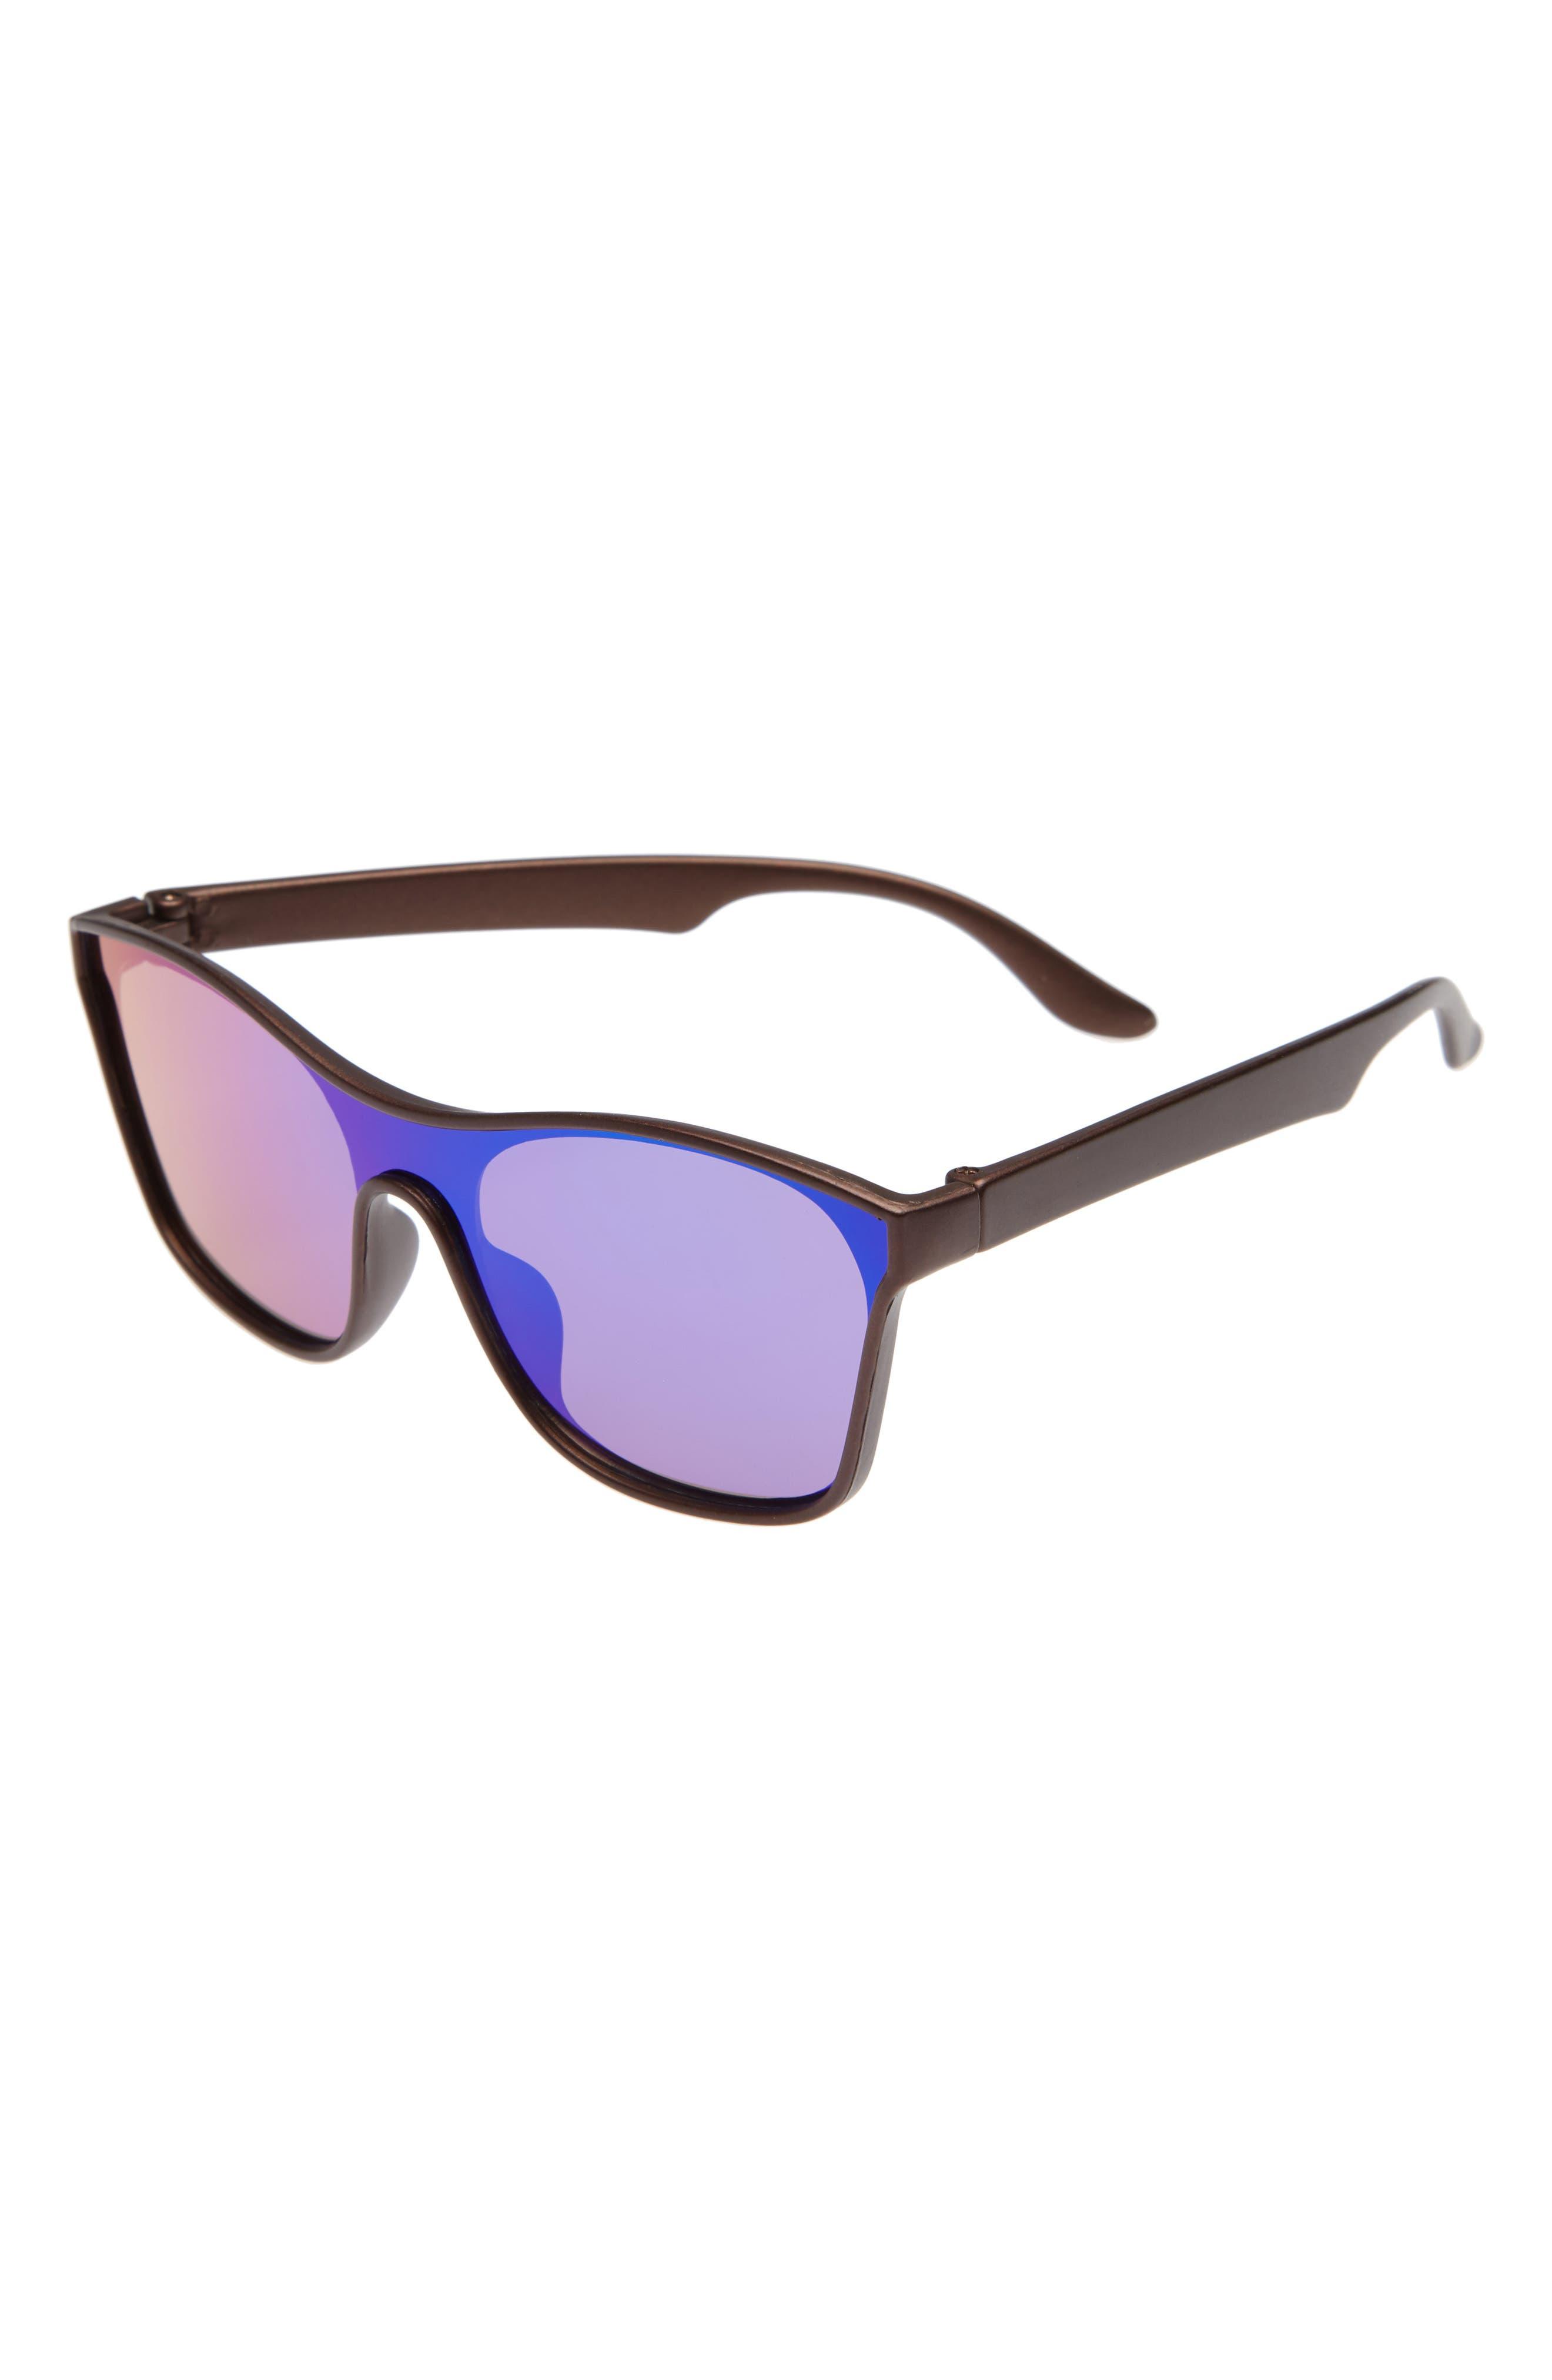 Mirrored Sunglasses,                             Main thumbnail 1, color,                             200